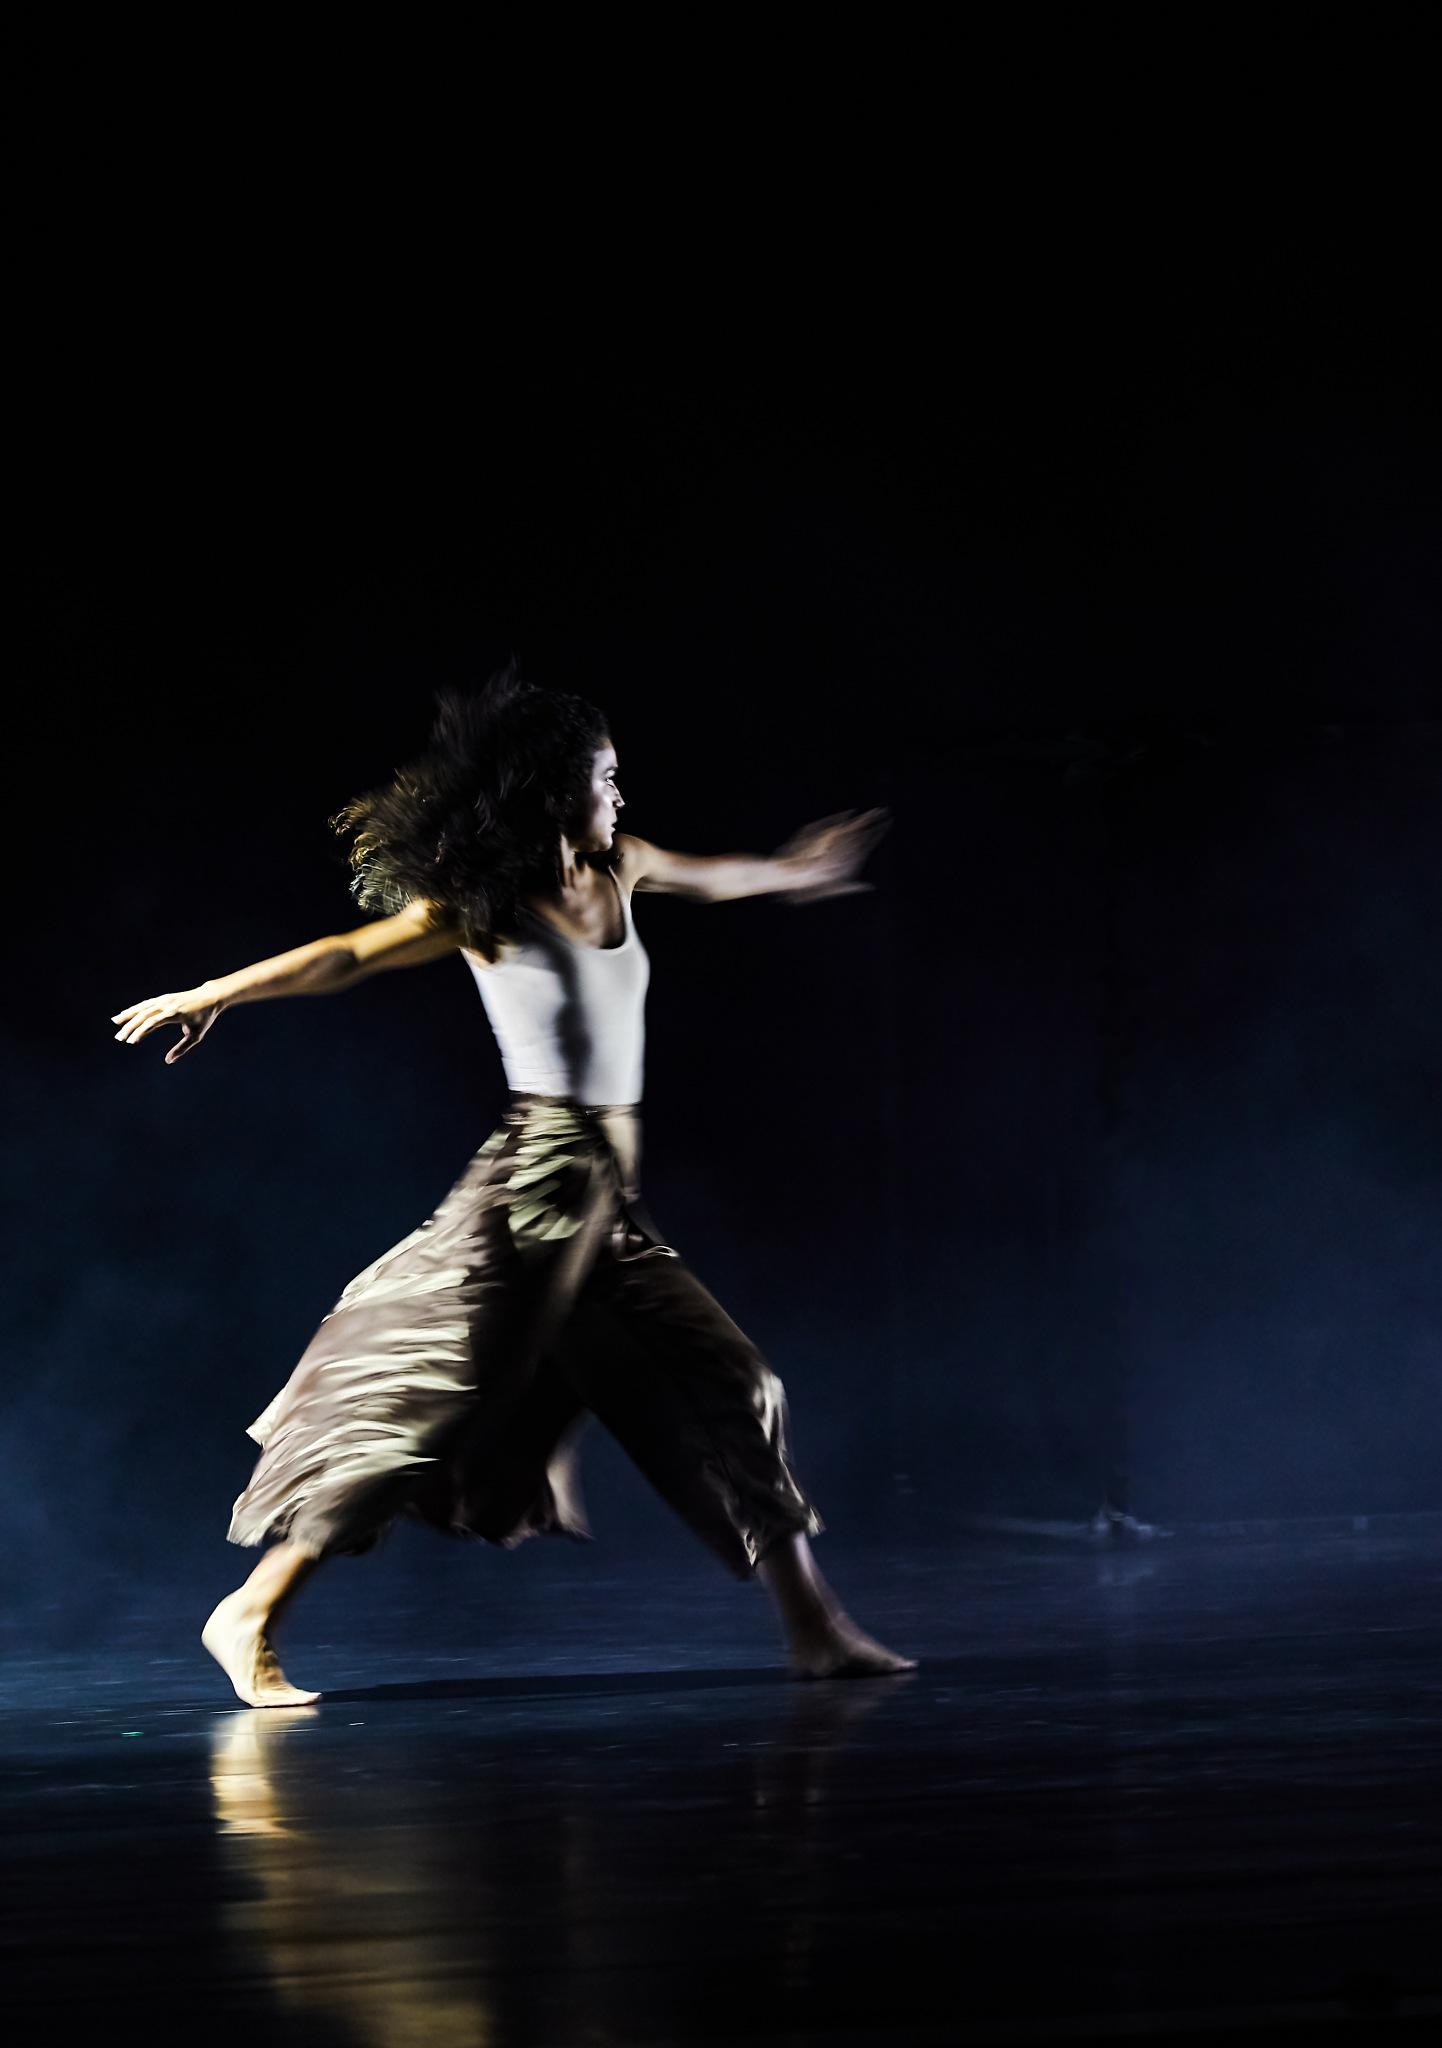 Nicole Dance School Cape Verde @ 2018 Macau international youth dance festival  02 by PatrickLeeKKAh9